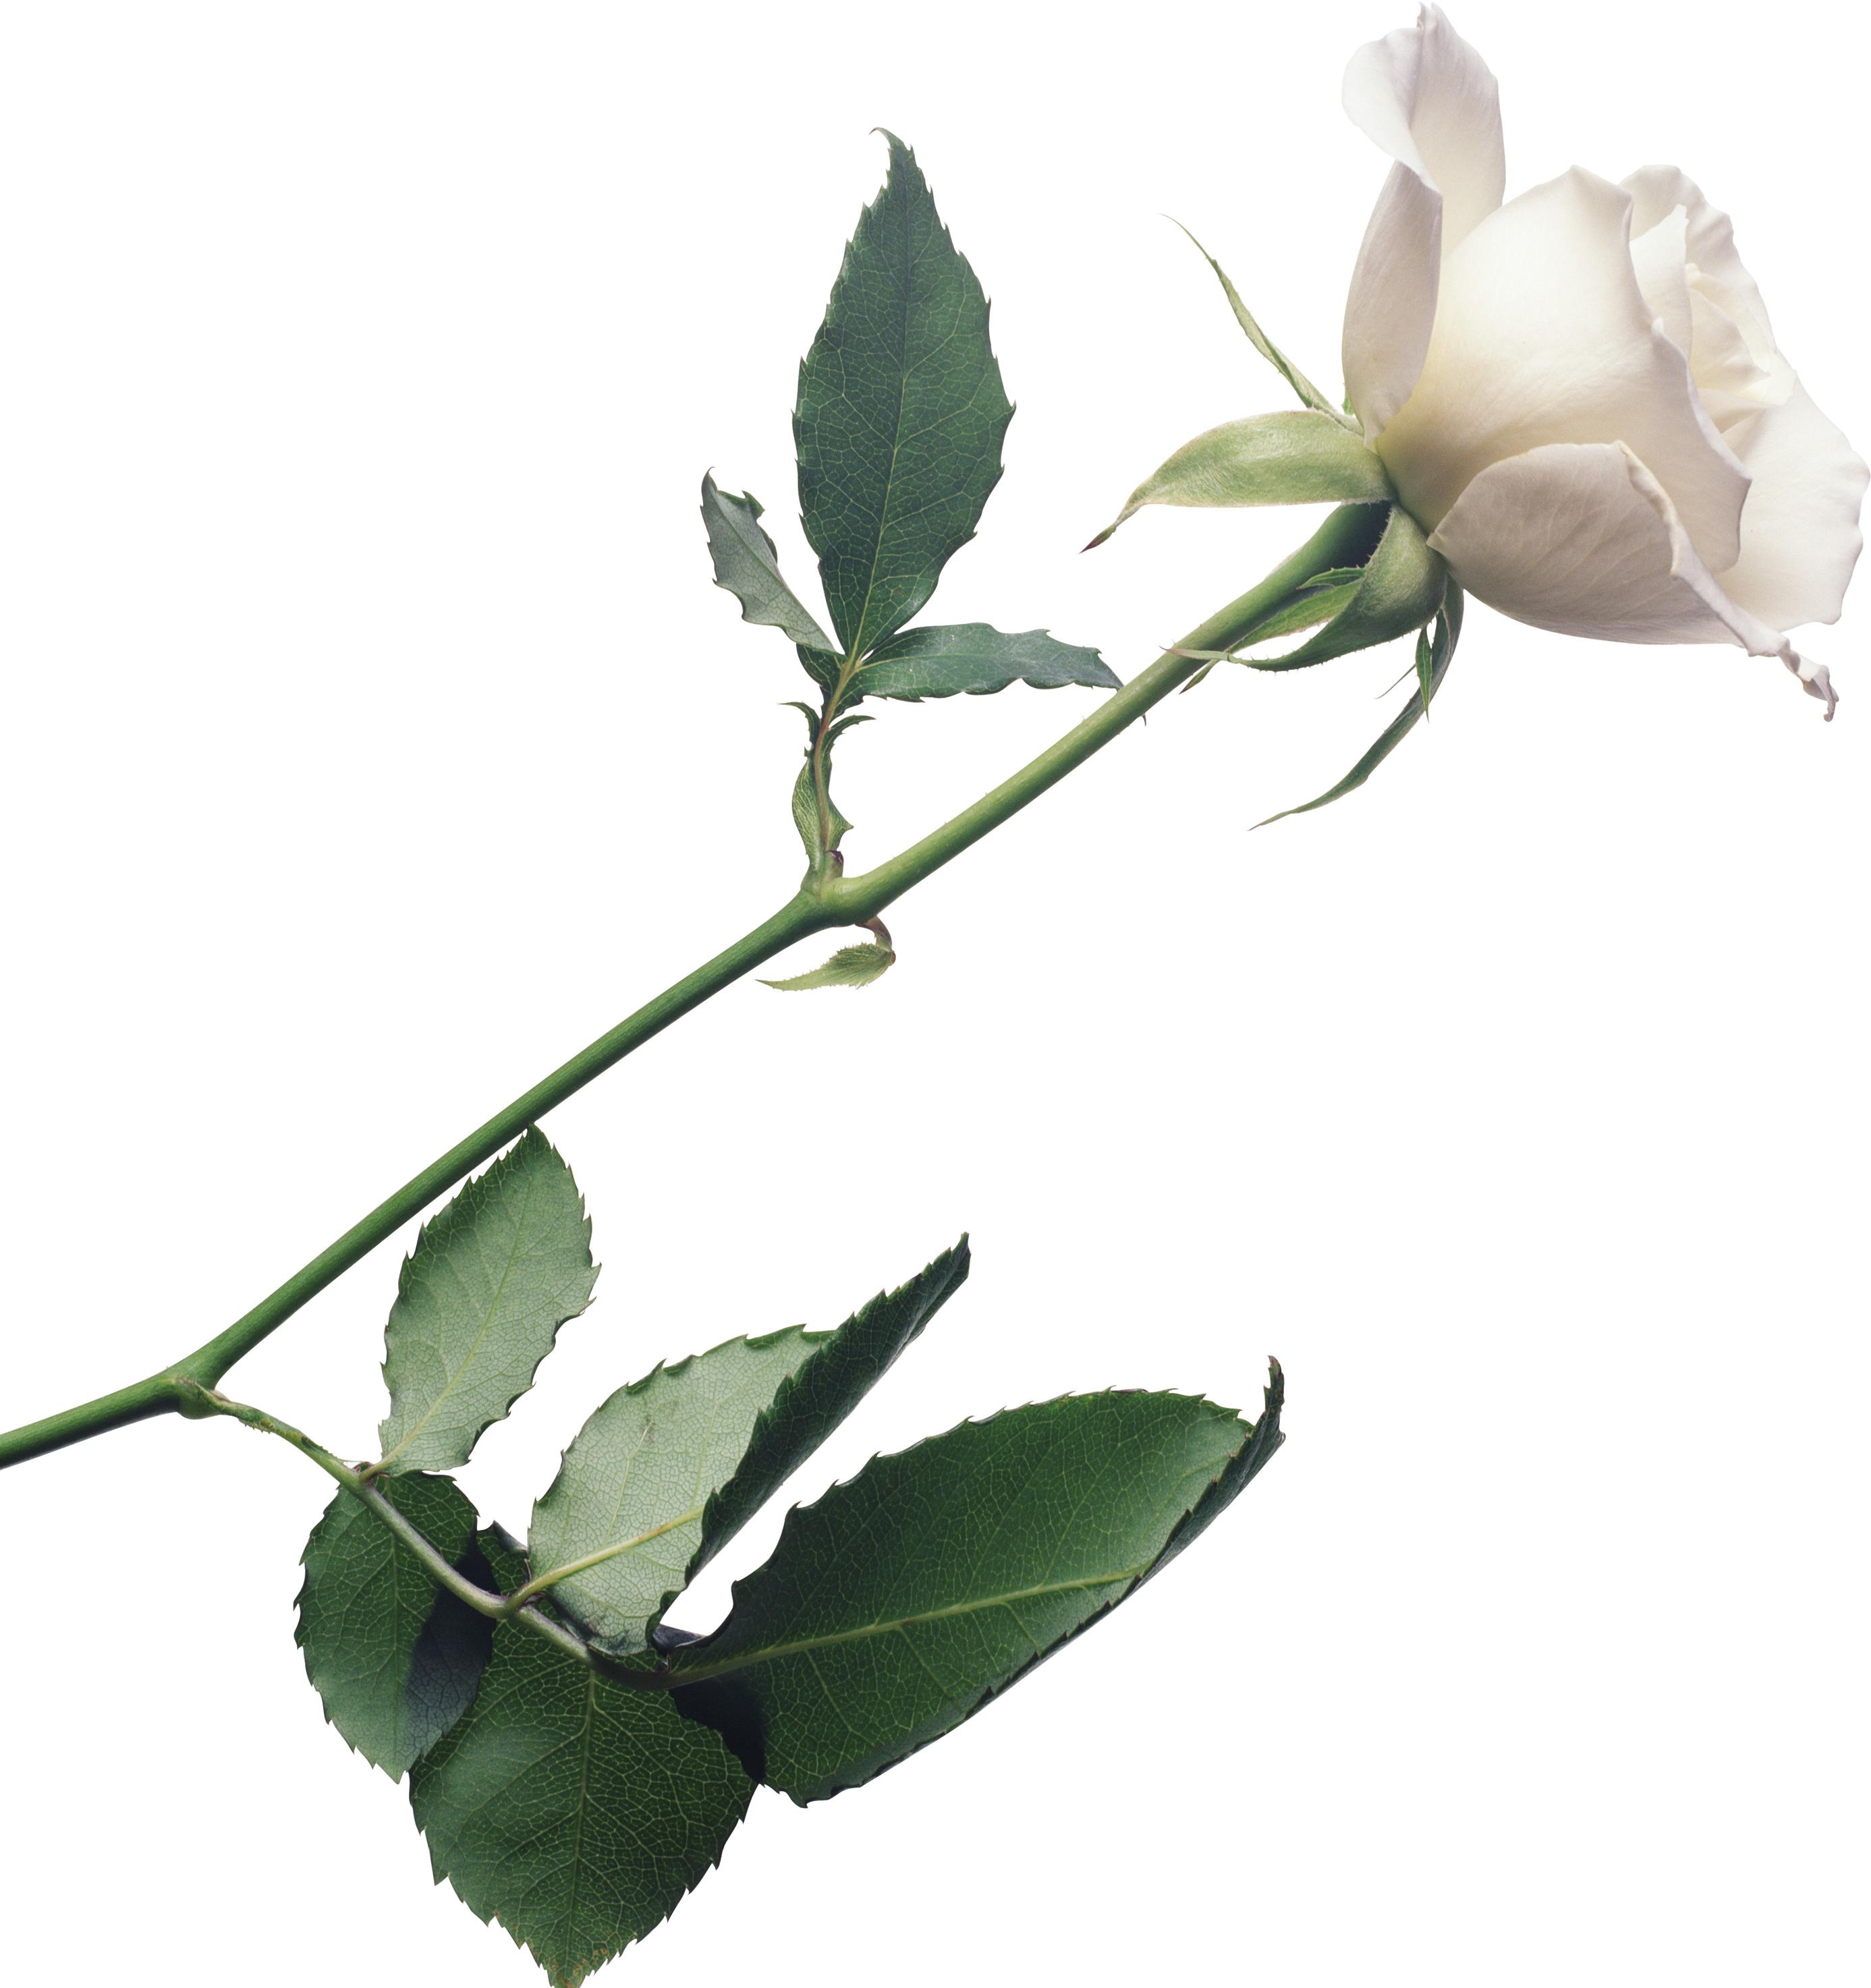 White Rose Png Image Flower White Rose Png Picture White Rose Png White Roses Background White Roses